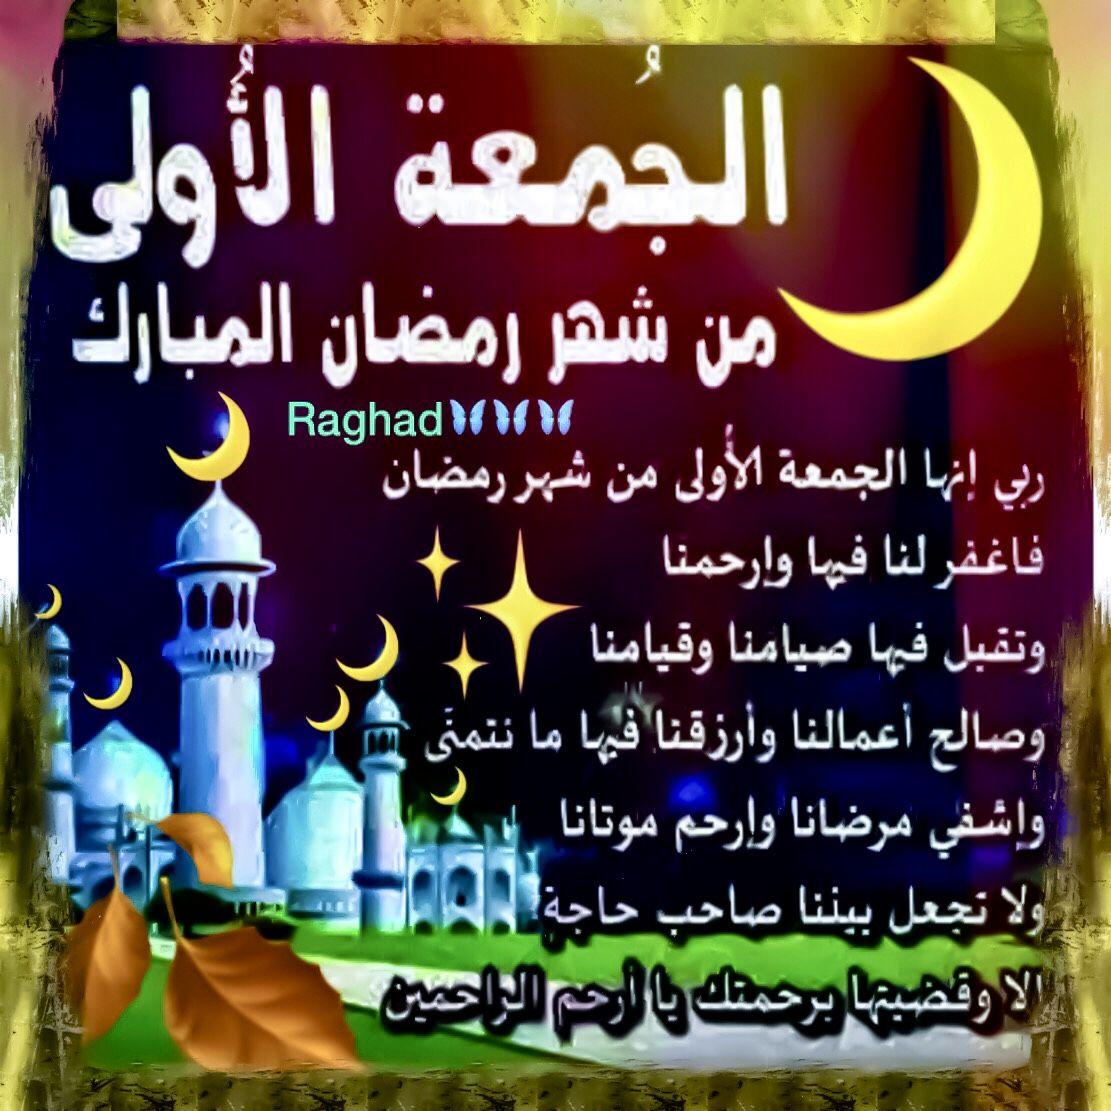 Desertrose أسأل الله في أول جمعة من شهر رمضان المبارك أن يتوج أيامنا وأيامكم بقلوب مبتهجة وهموم منفرجة وصحة عامرة وأعمال ص Ramadan Kareem Ramadan Allah